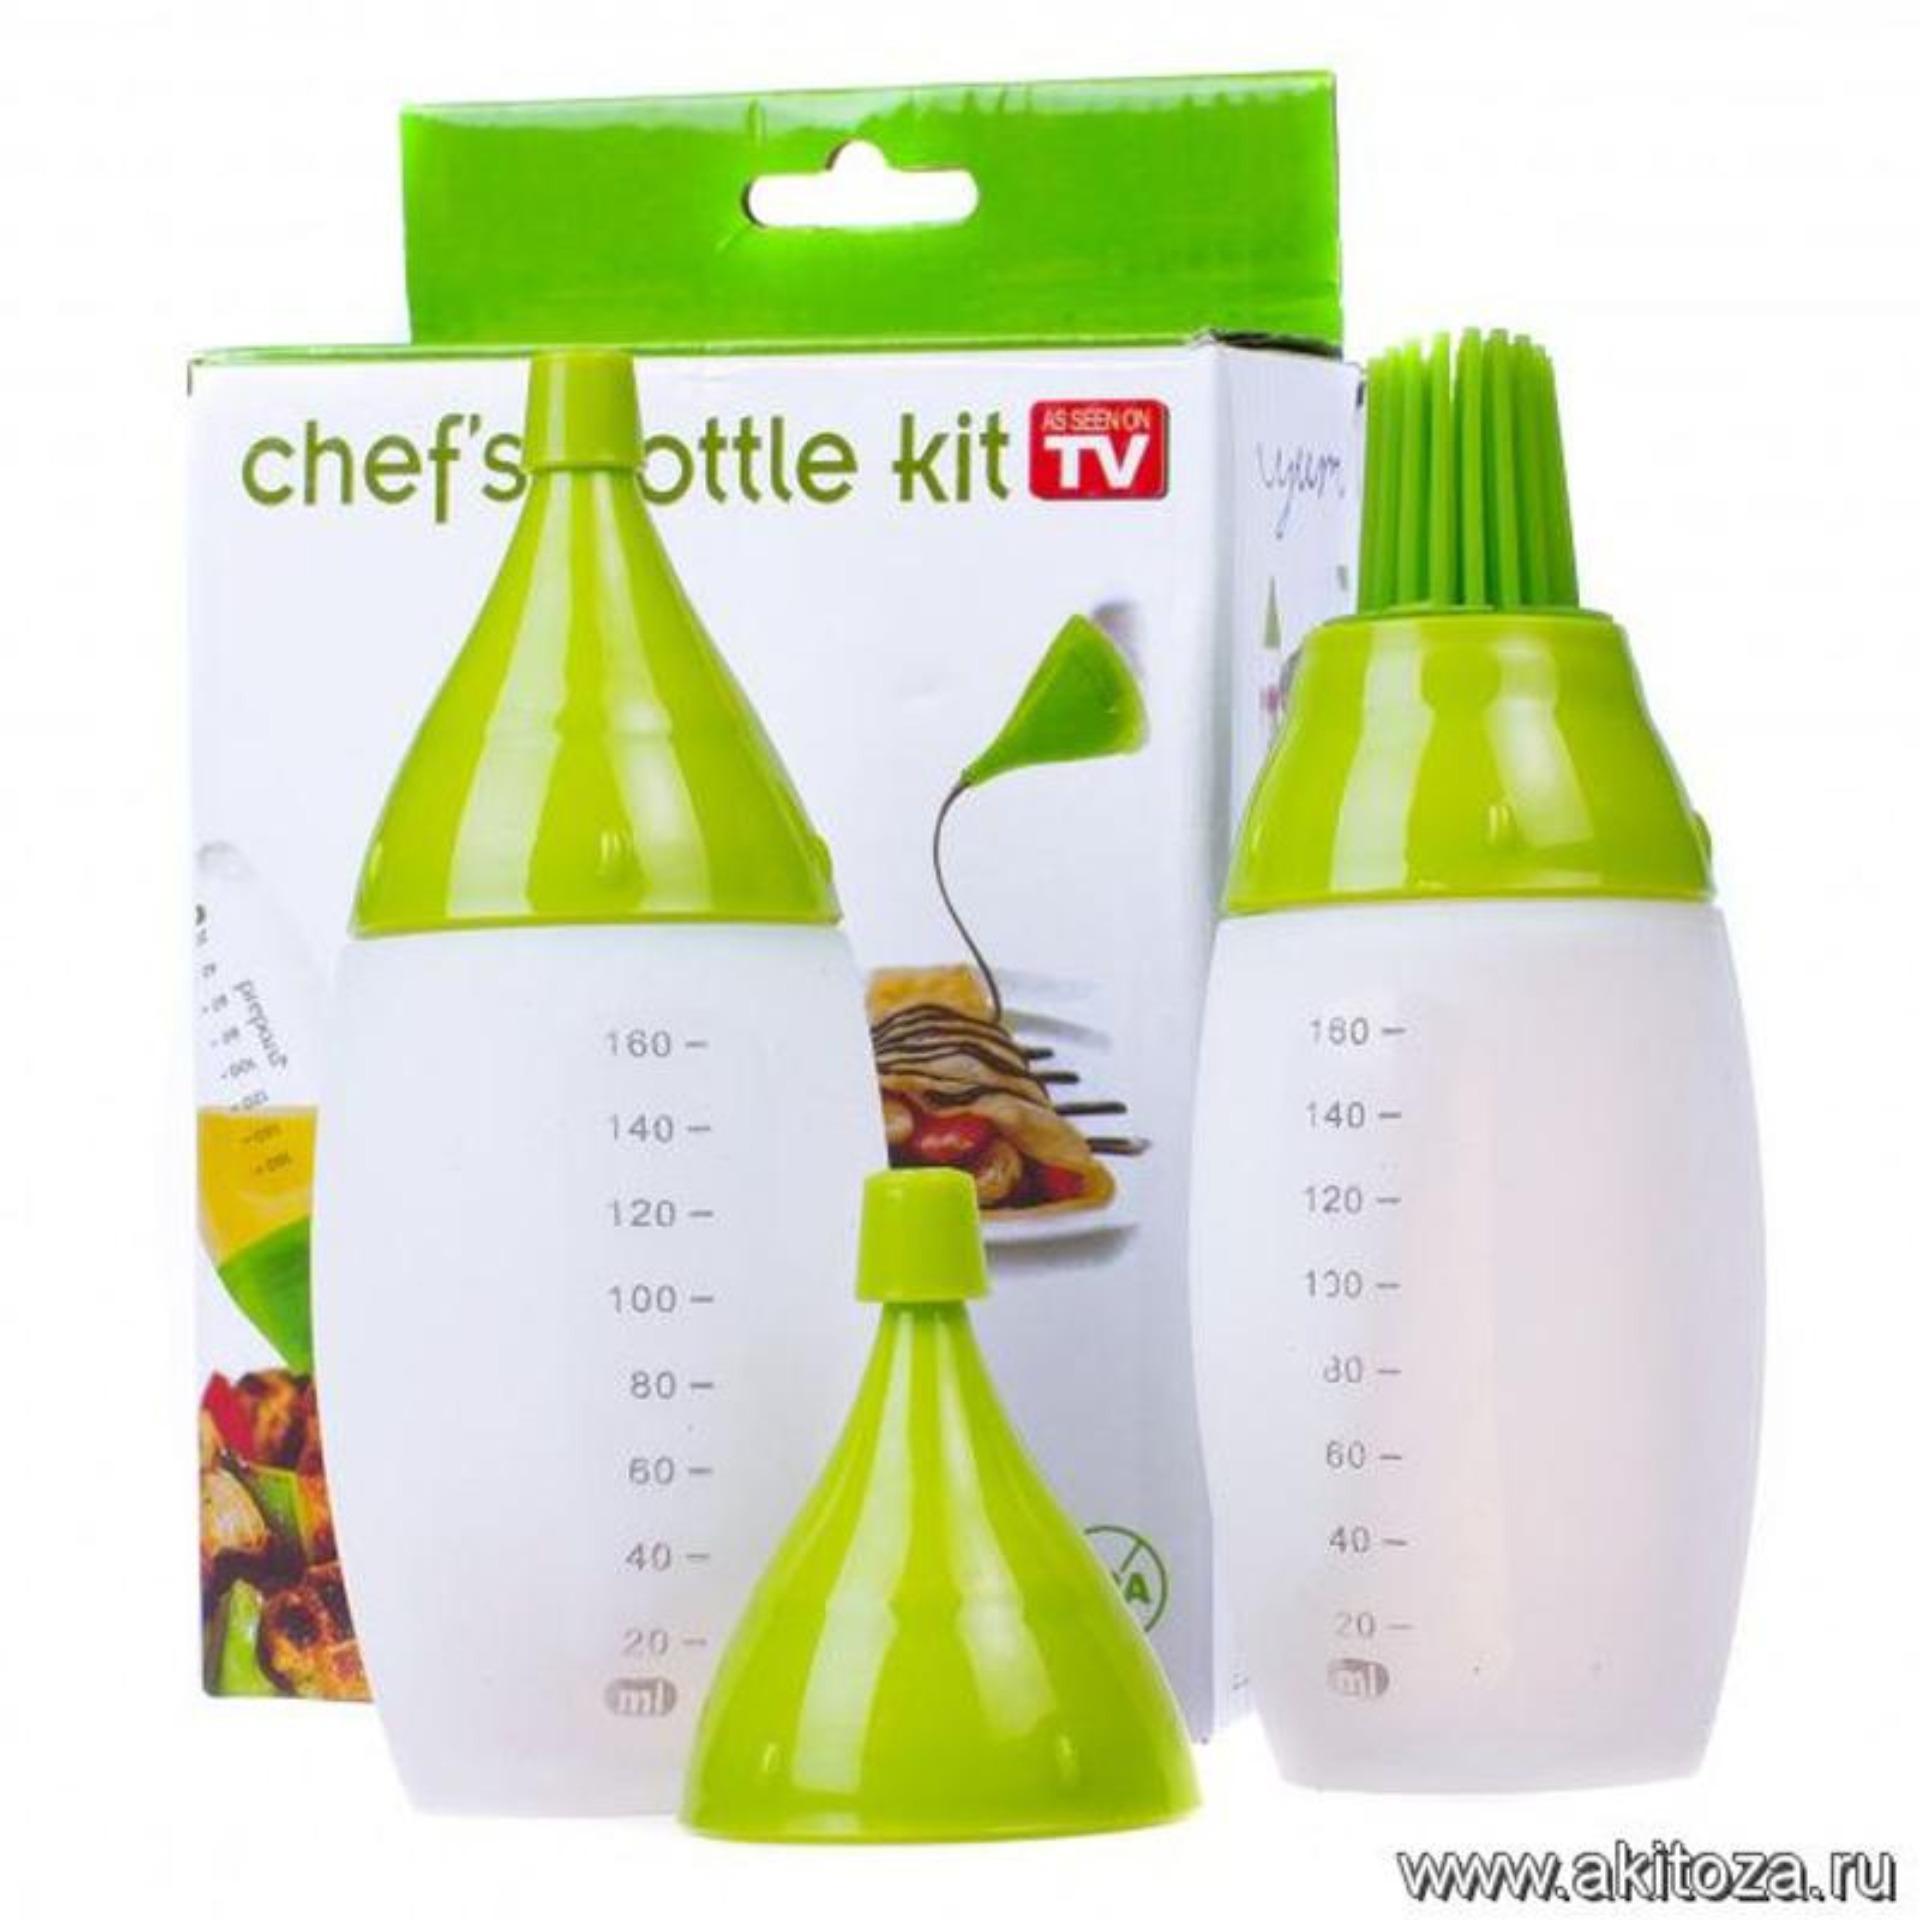 Chefs Bottle Kit Botol Sembur Pencet Oles Chef Masak Bumbu Barberque .